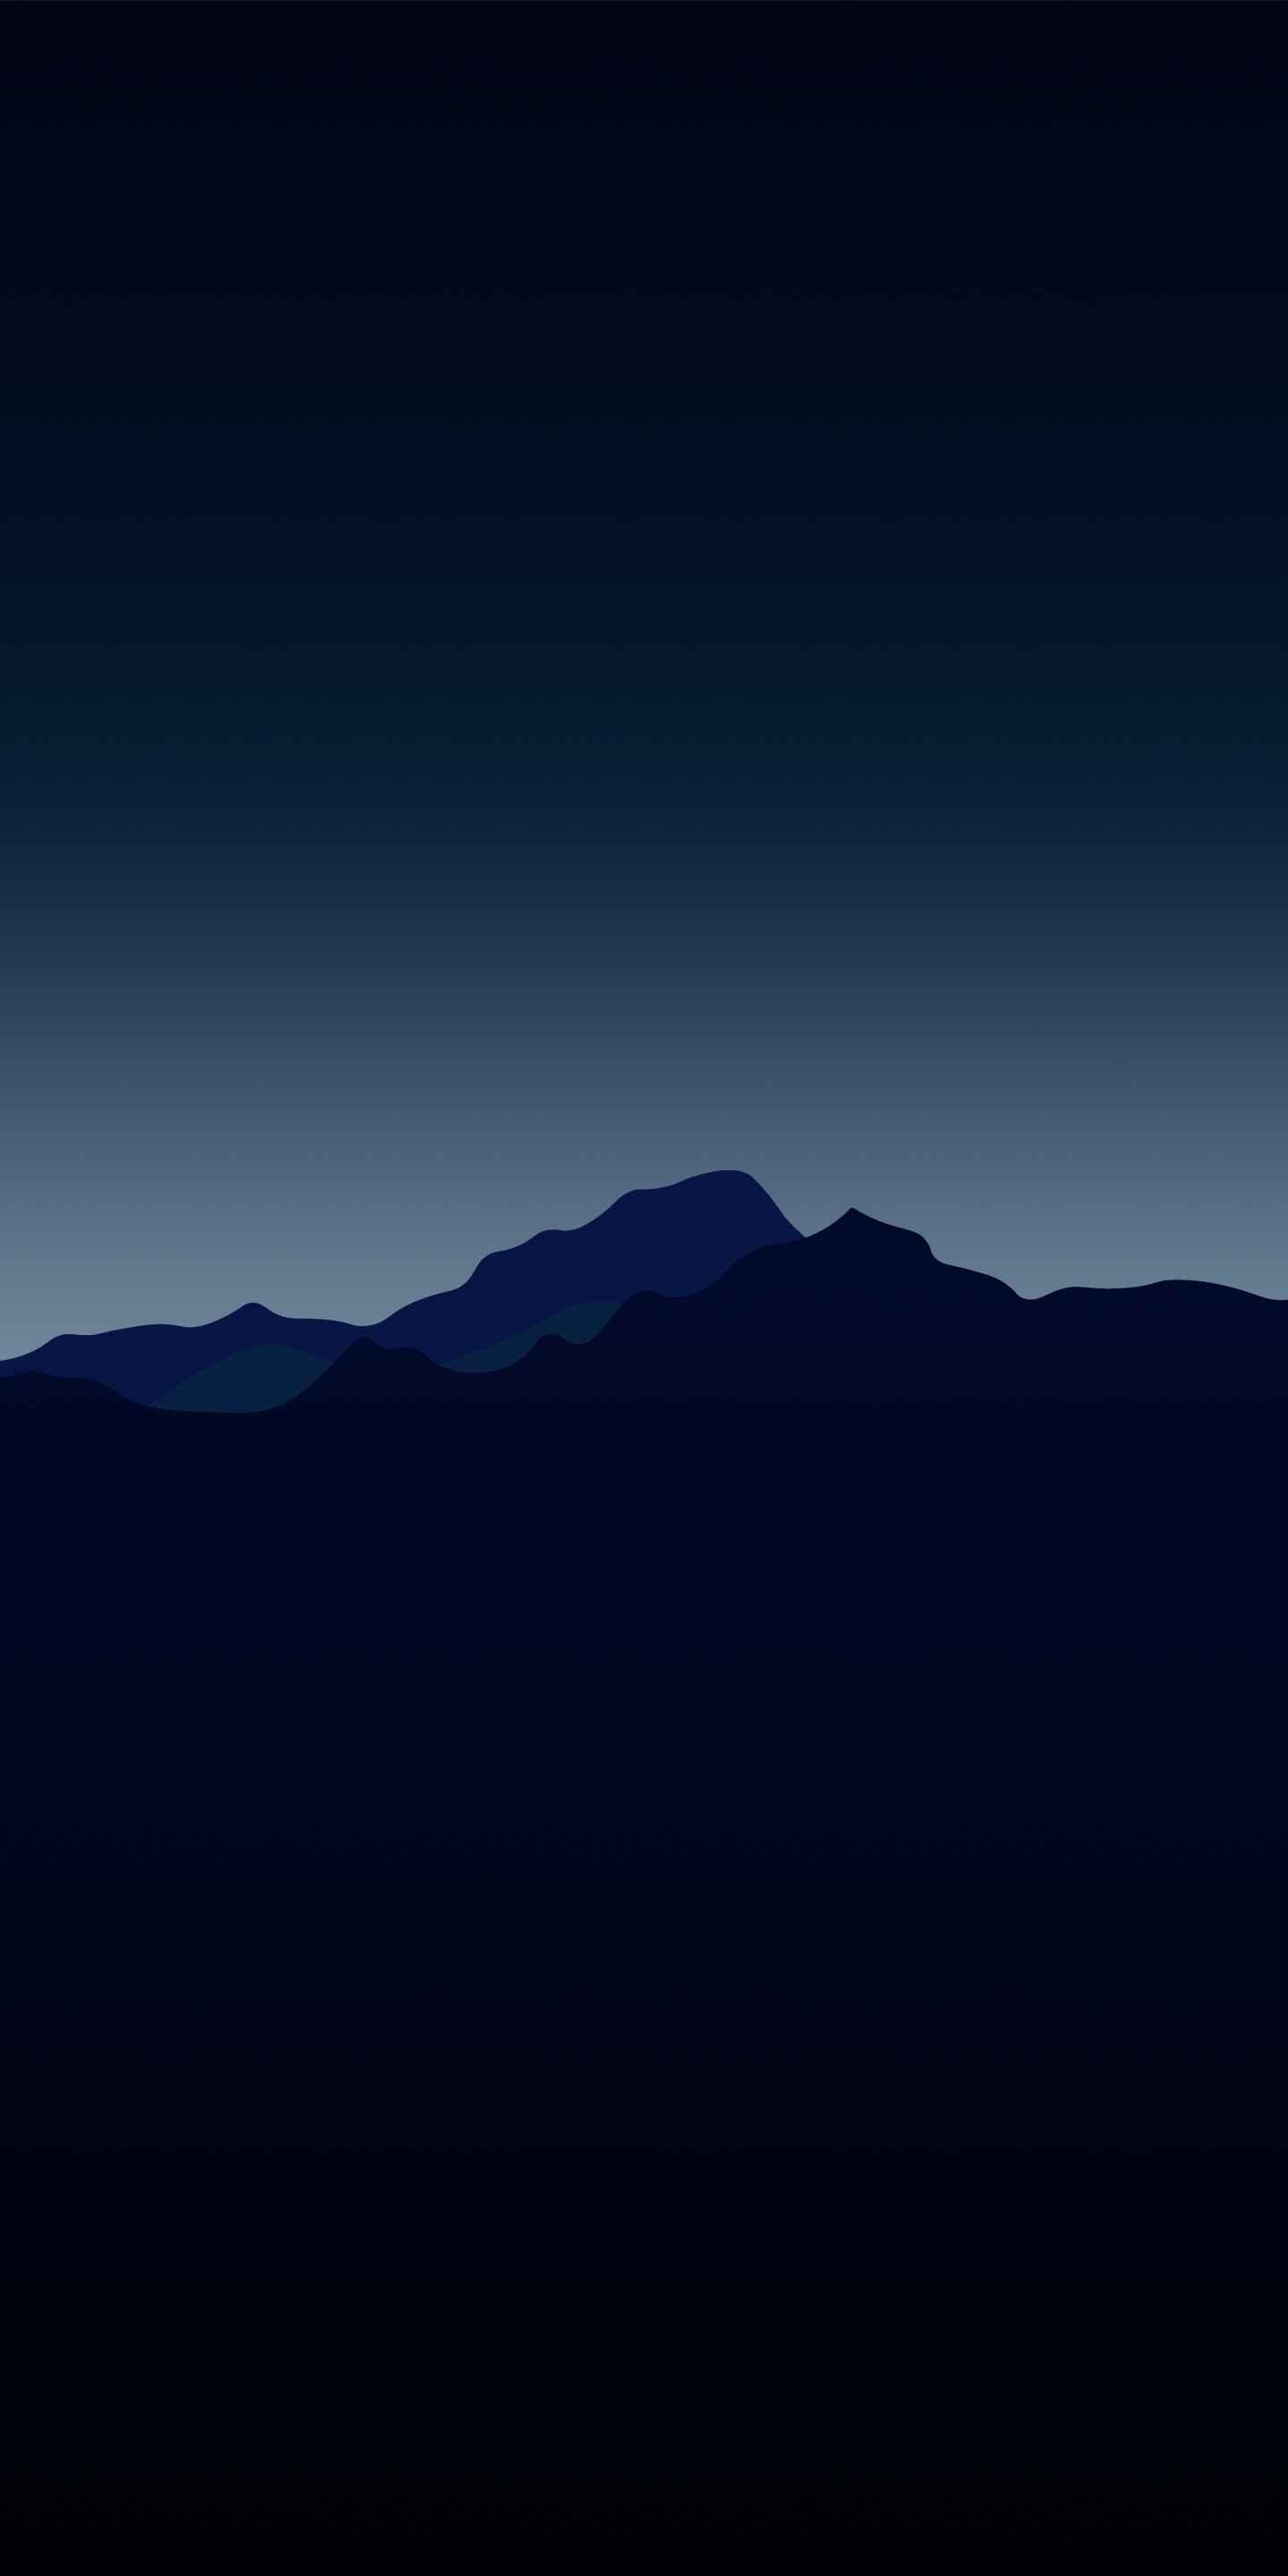 Night iPhone Wallpaper